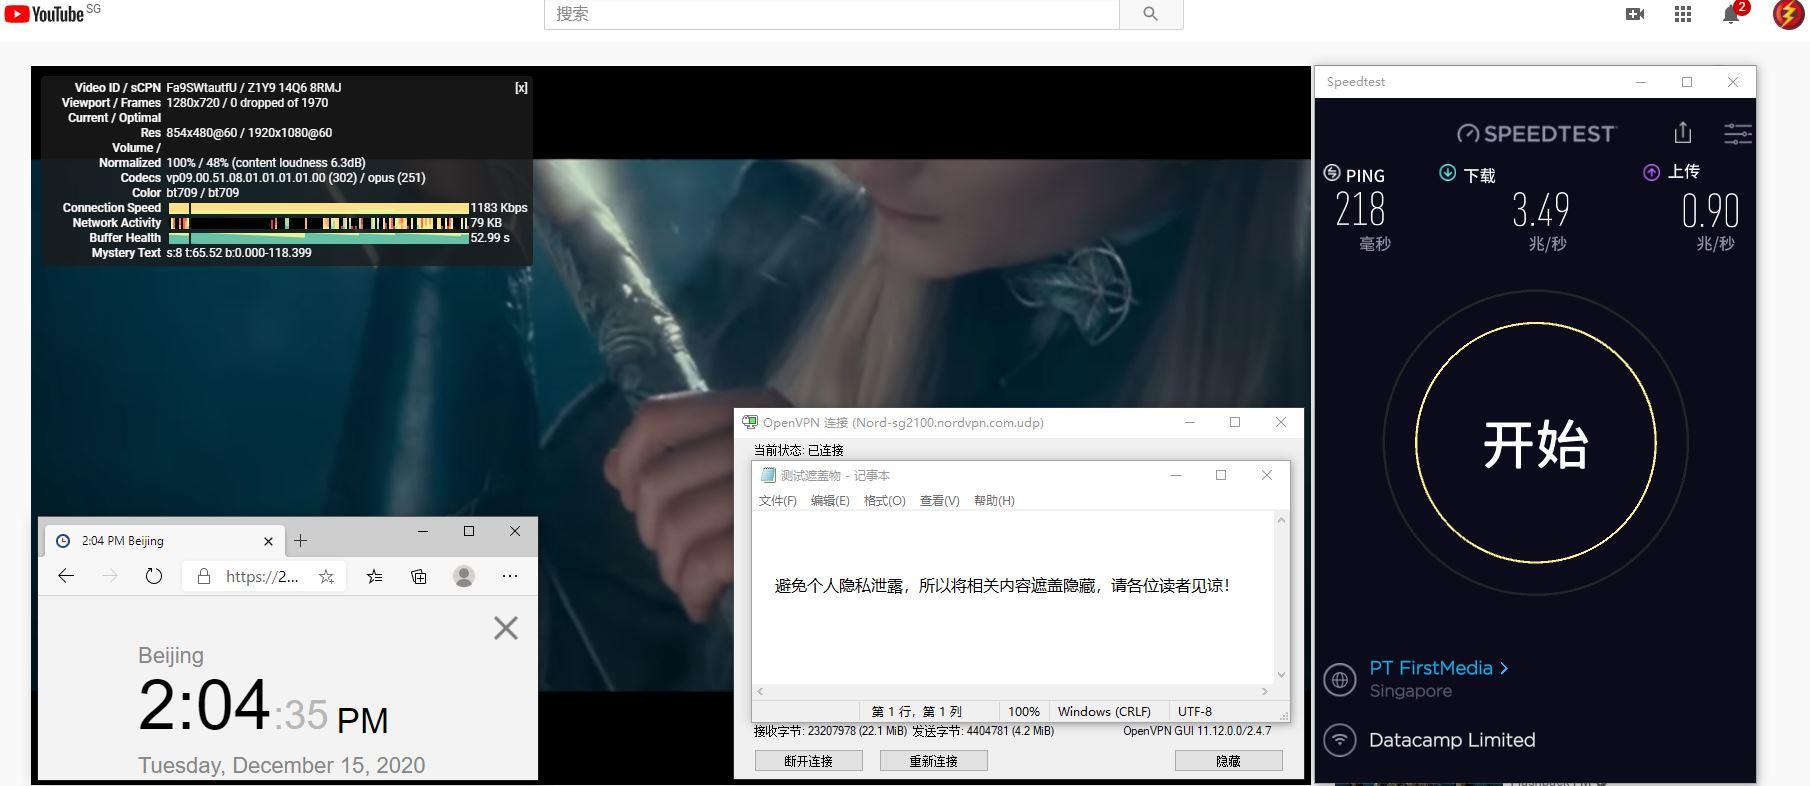 Windows10 NordVPN OpenVPN Gui SG2100 服务器 中国VPN 翻墙 科学上网 测试 - 20201215